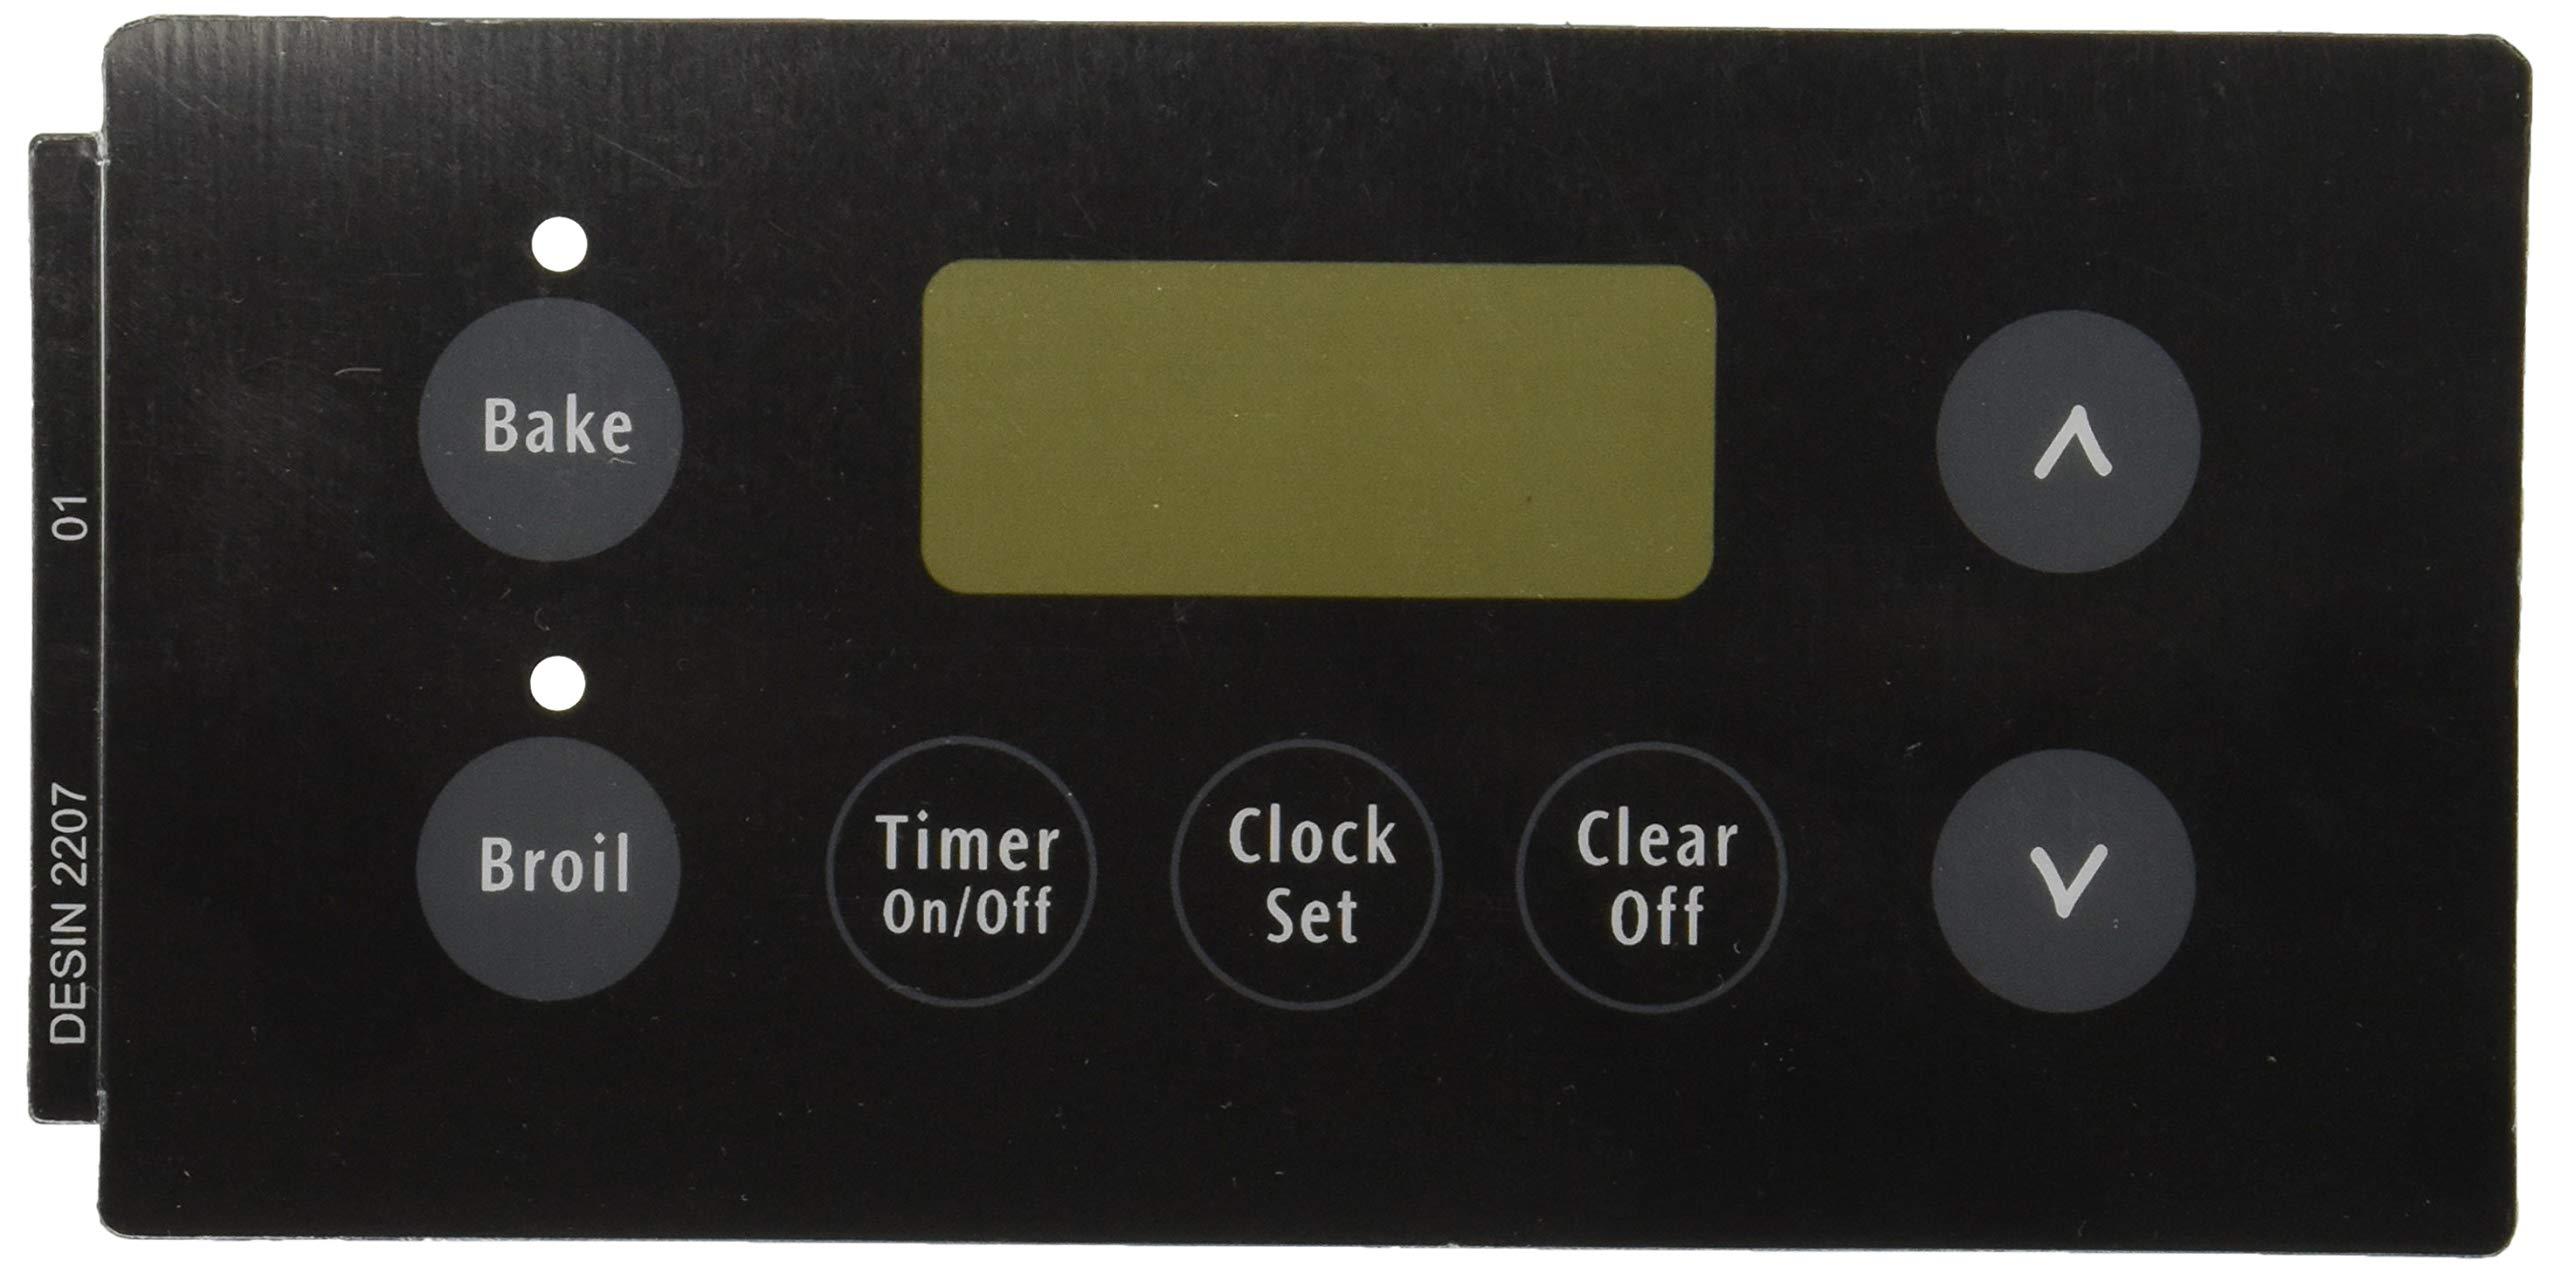 Frigidaire 316220701 Overlay Range/Stove/Oven